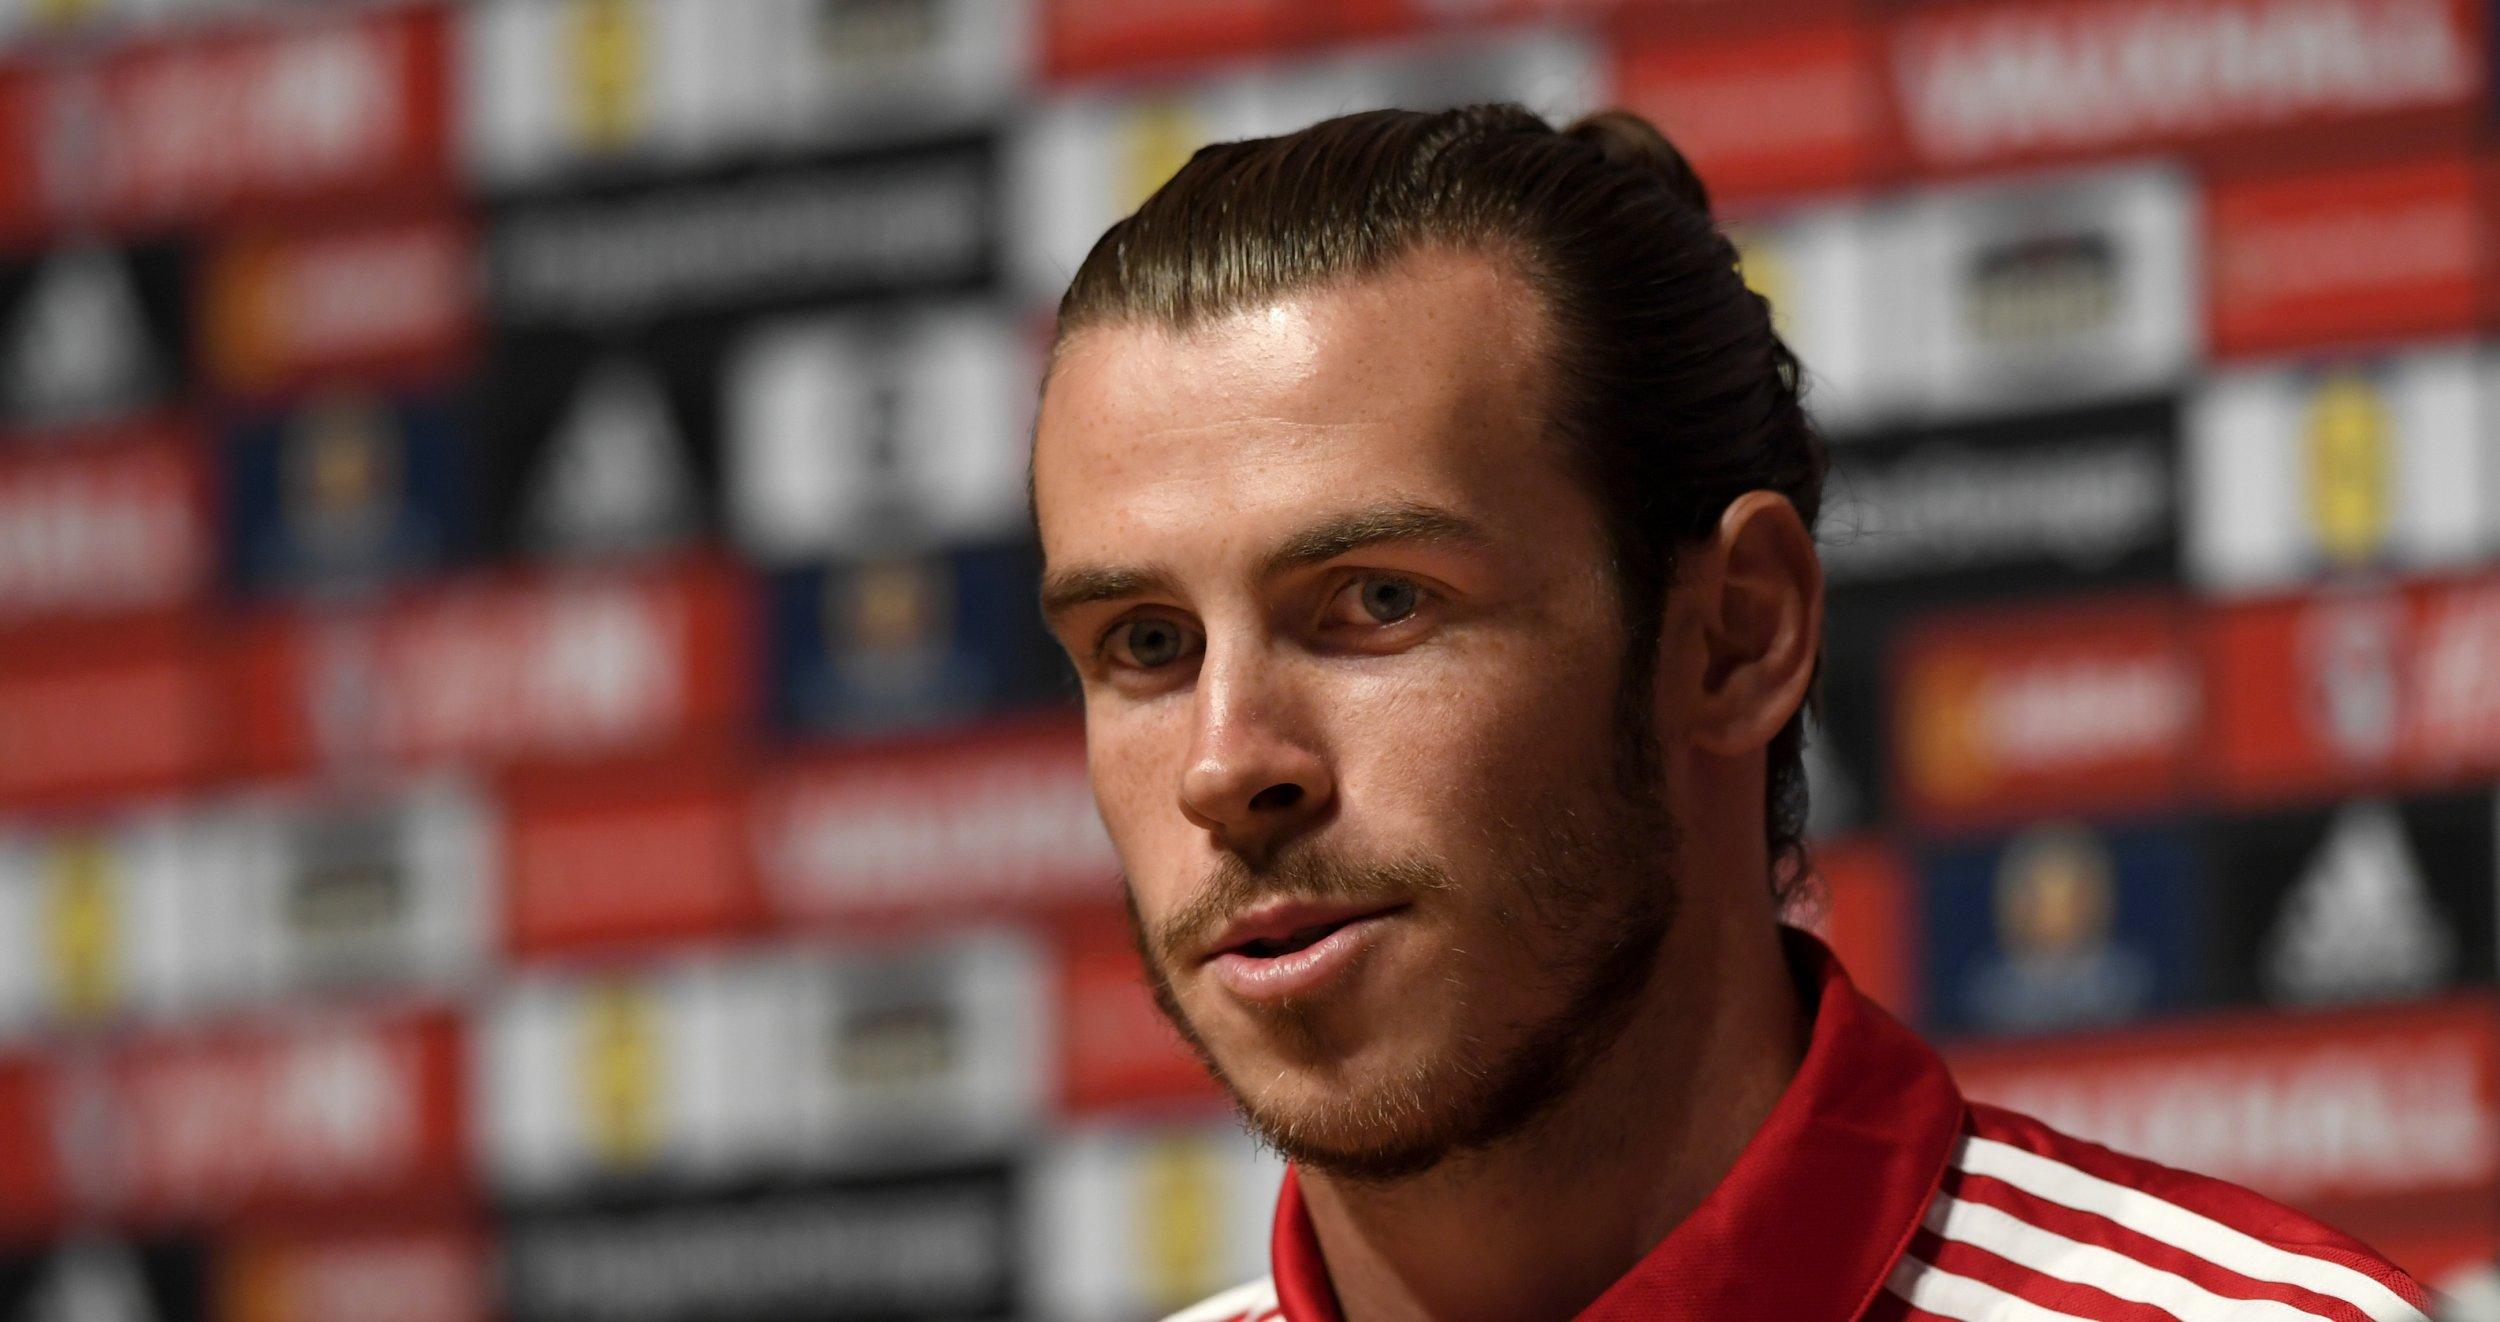 Wales winger Gareth Bale